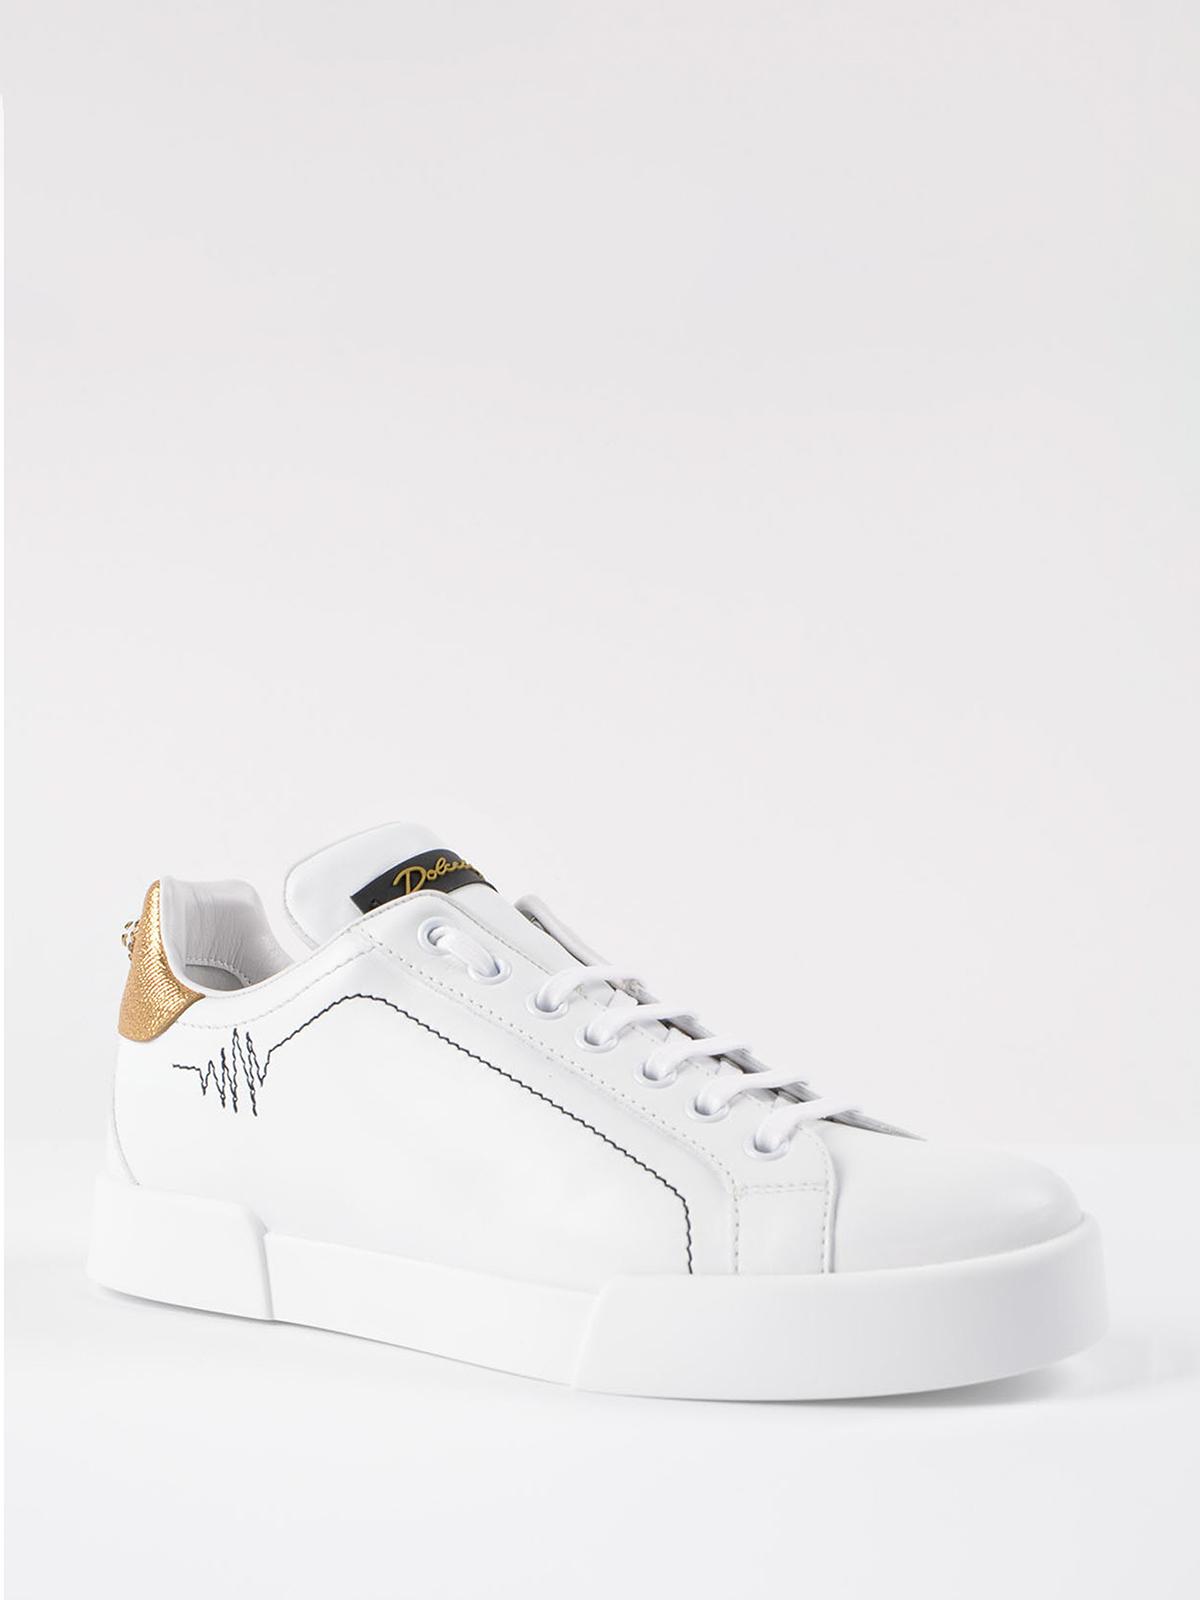 Dolce & Gabbana Sneaker in pelle con maxi perla sneakers